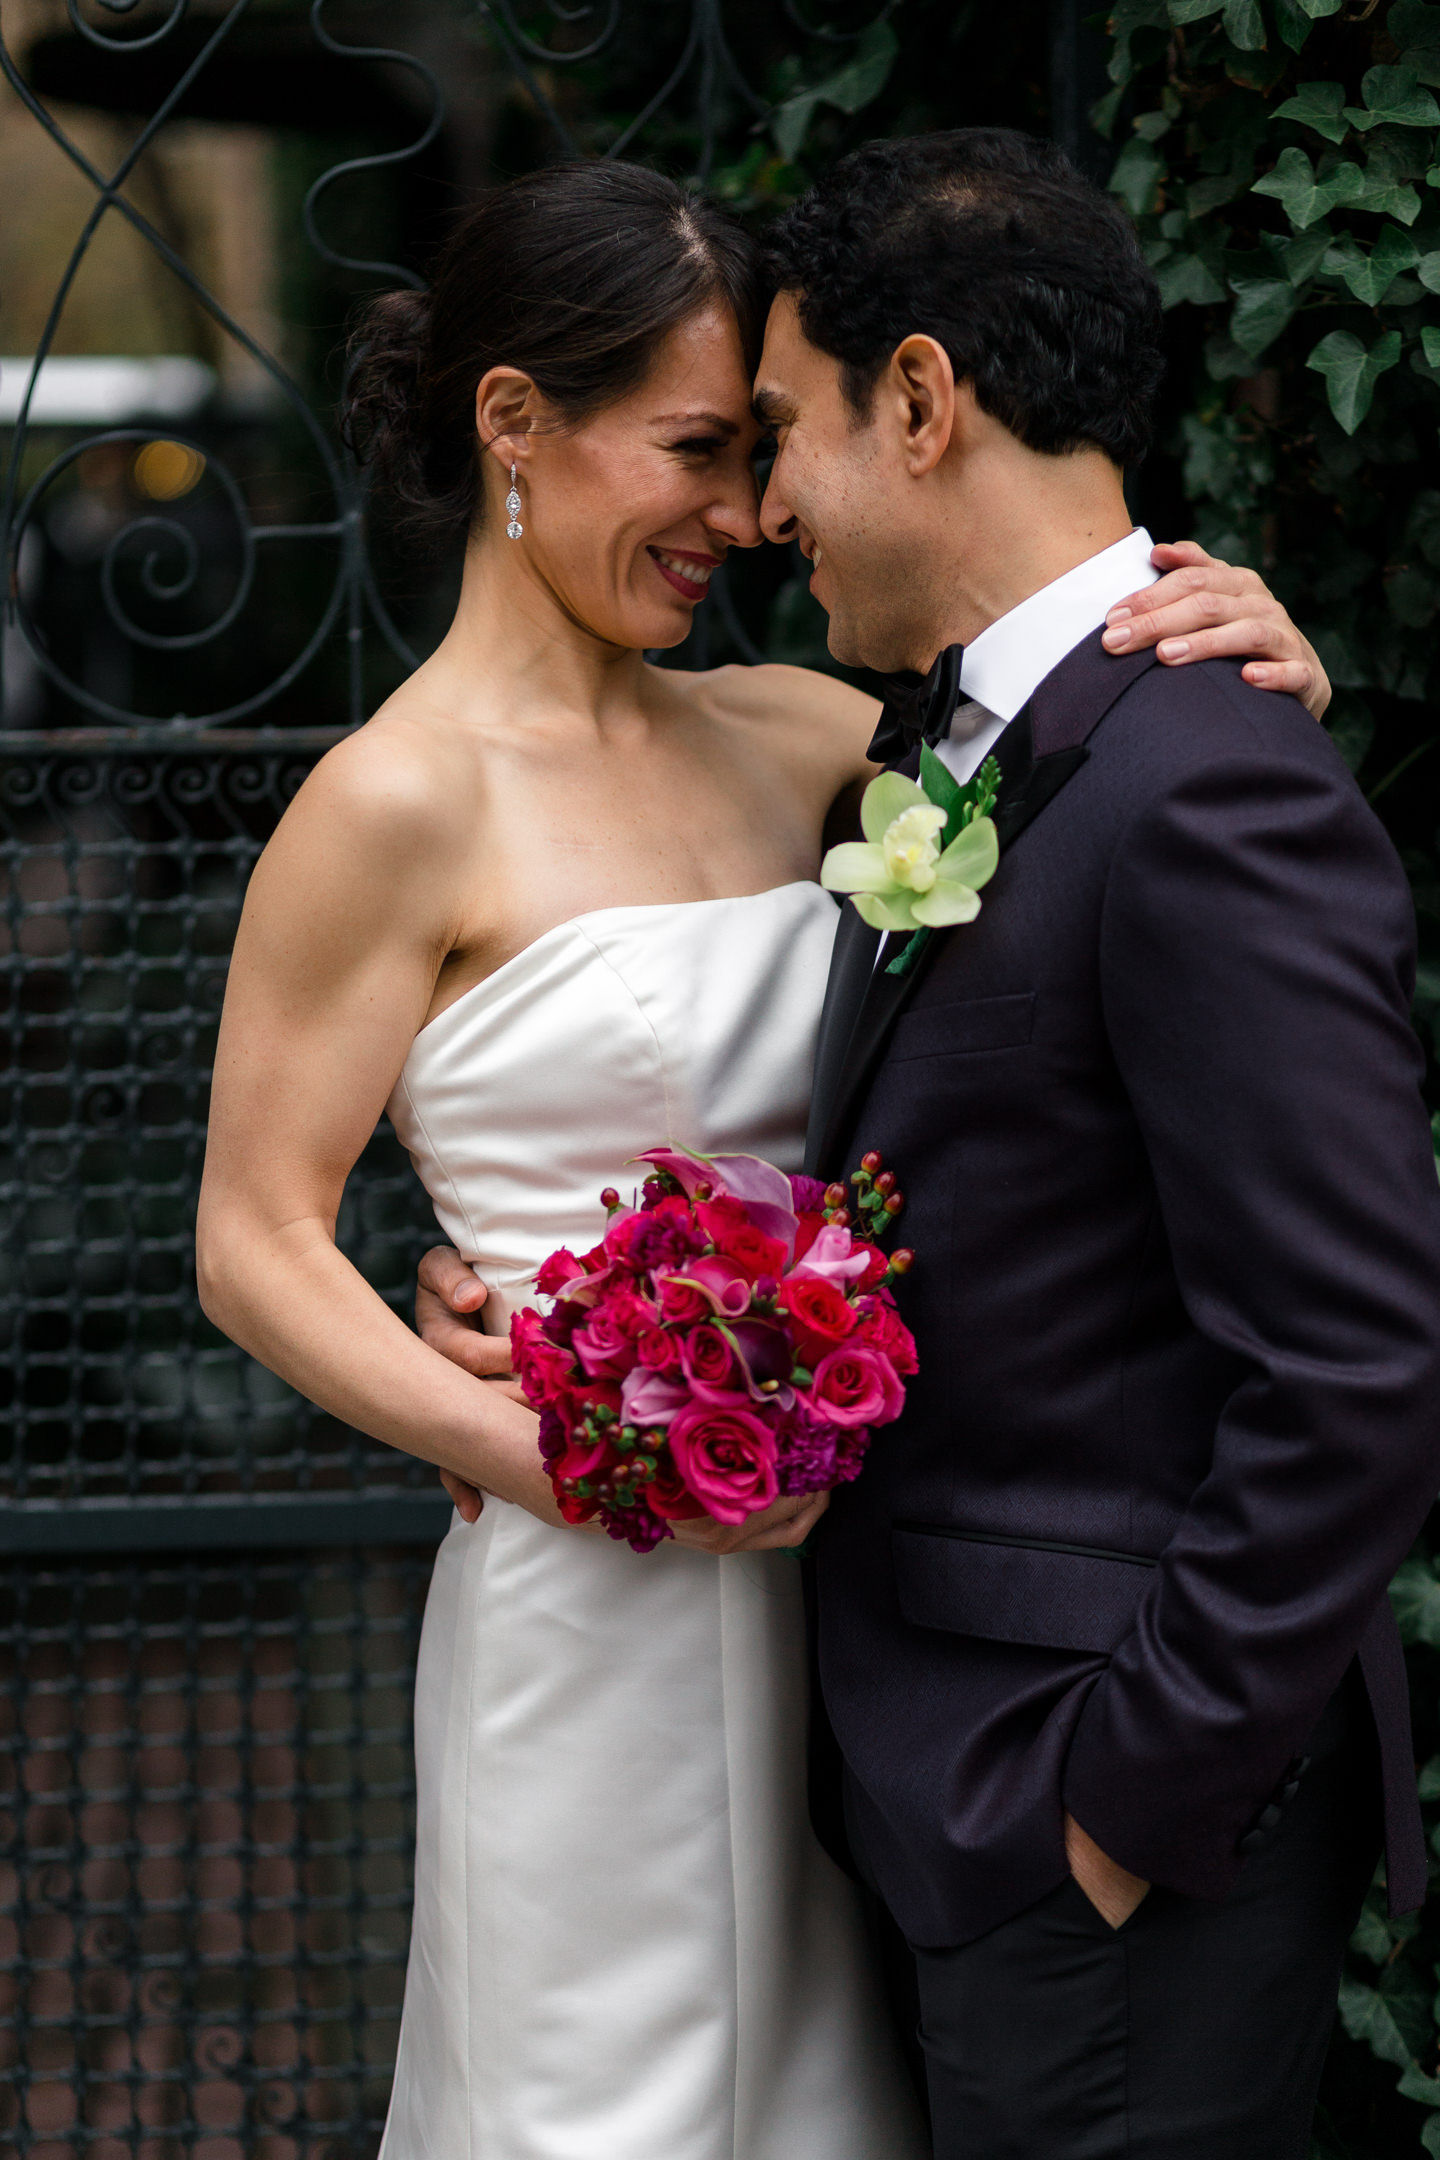 Documentary-Wedding-Photography-Andrew-Tat-Maria & AJ-04.jpg